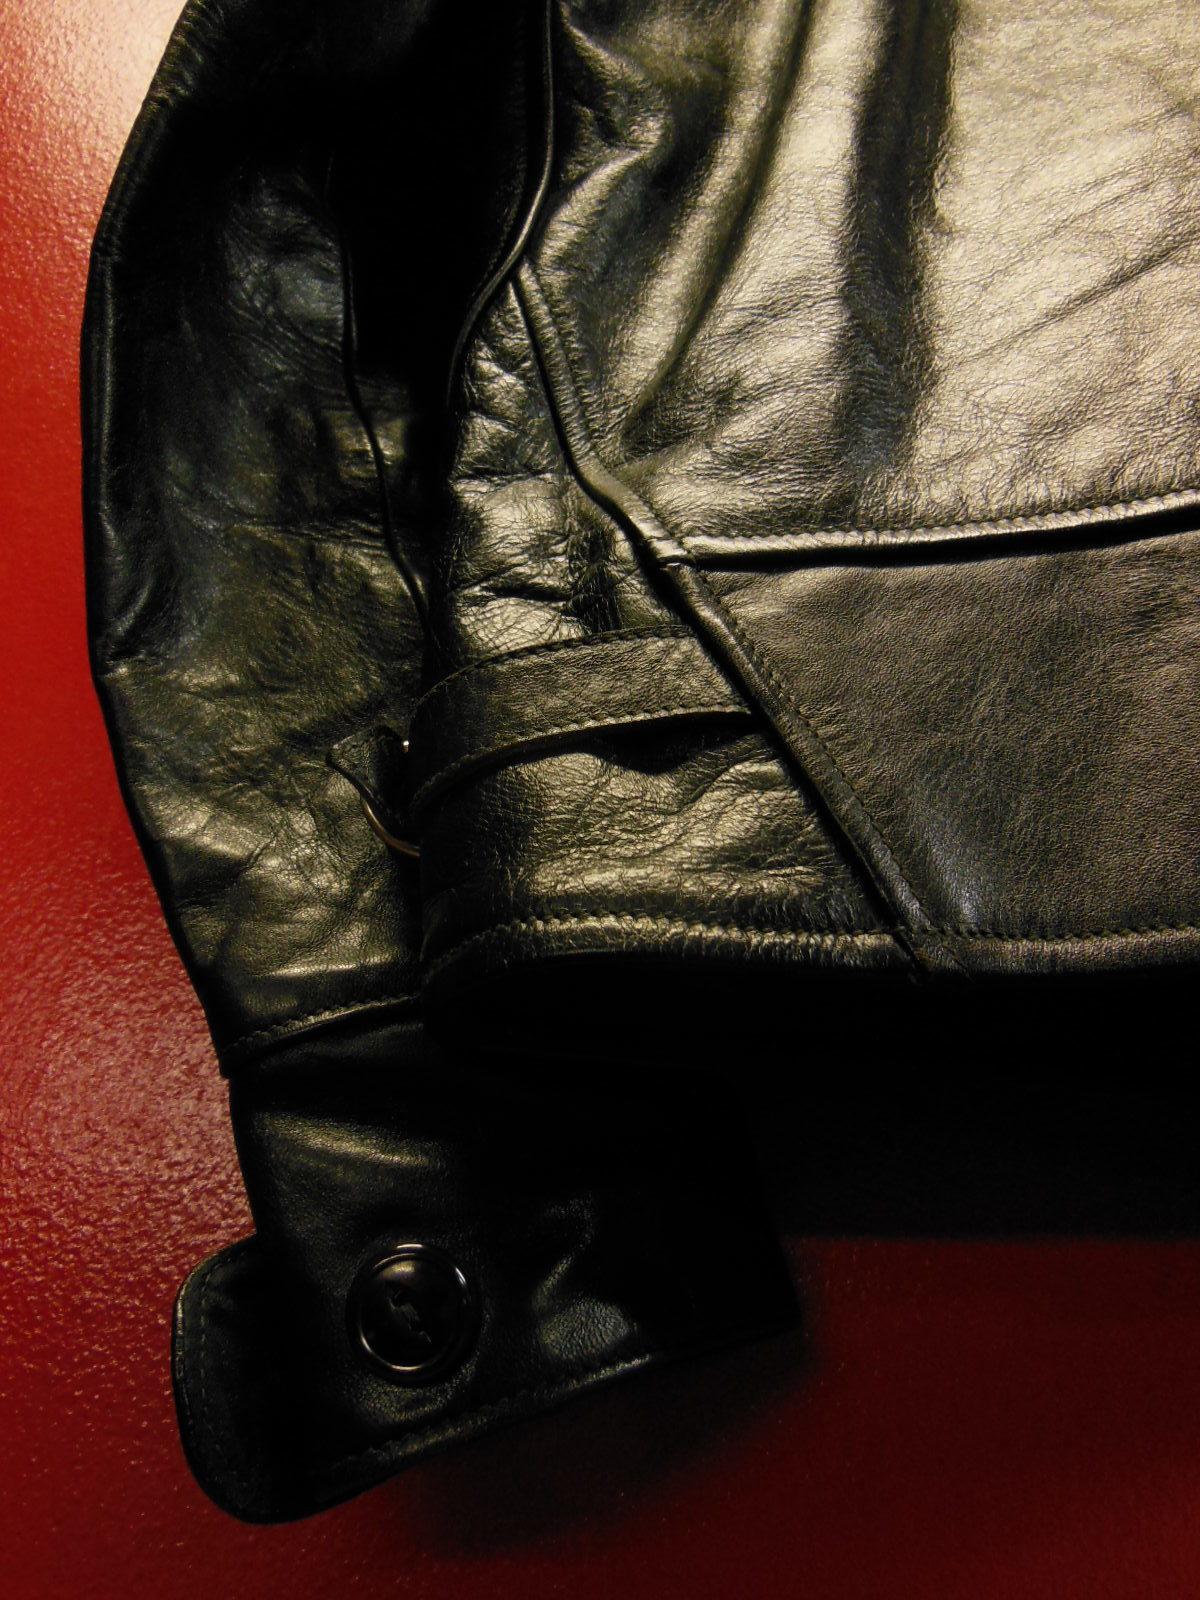 USED HIMEL BROTHERS LEATHER HERON 1929/新喜皮革製黒ホースハイド/SIZE-36/ボタンフロント A-1 ジャケット_c0187684_15045370.jpg